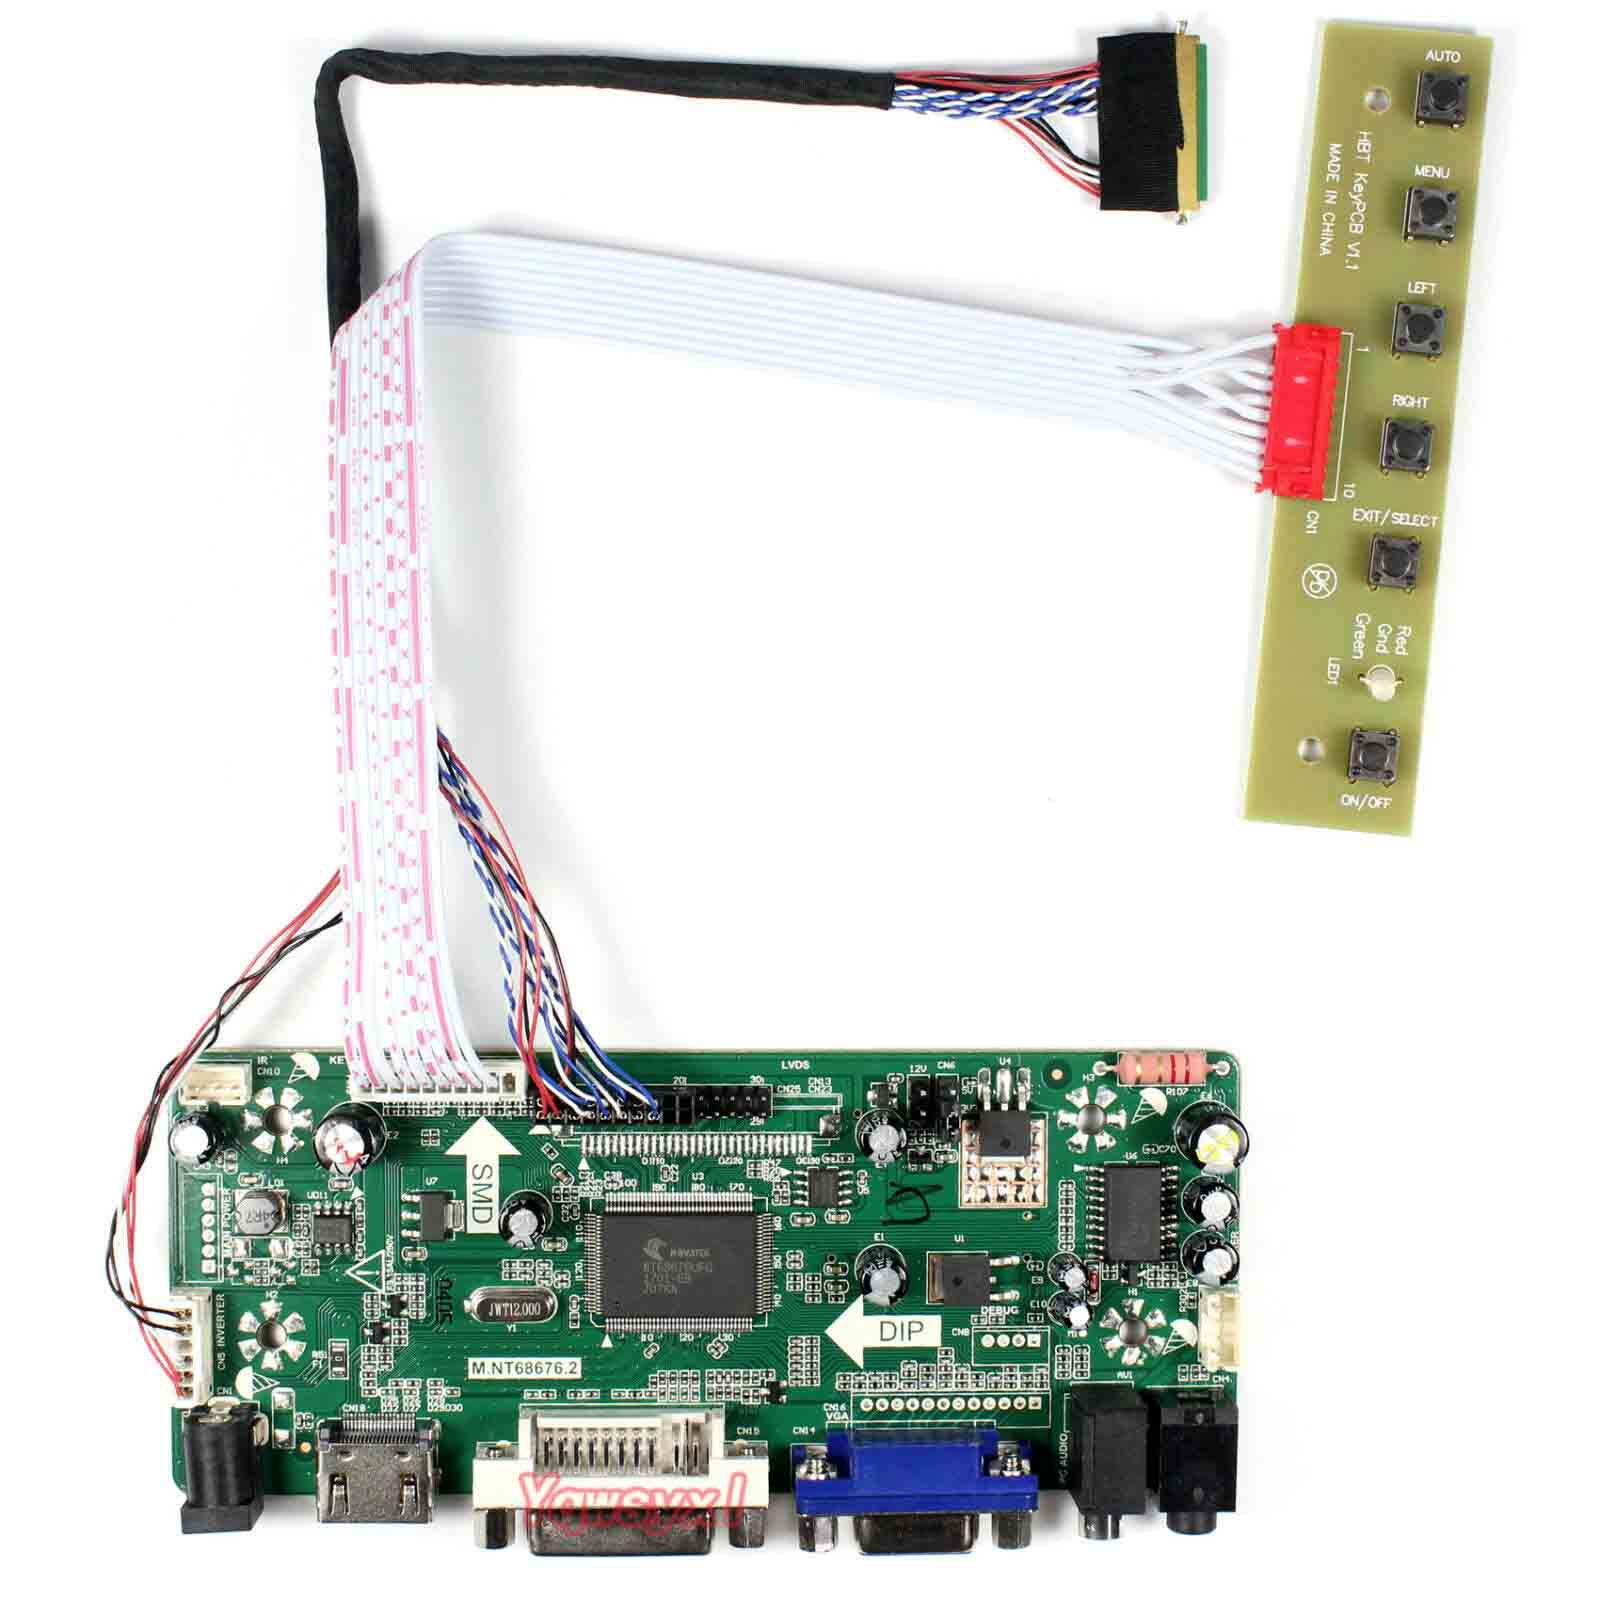 Yqwsyxl Control Board Monitor Kit For B140XW01 V0   B140XW01 V2  HDMI + DVI + VGA LCD LED  Screen  Controller Board Driver